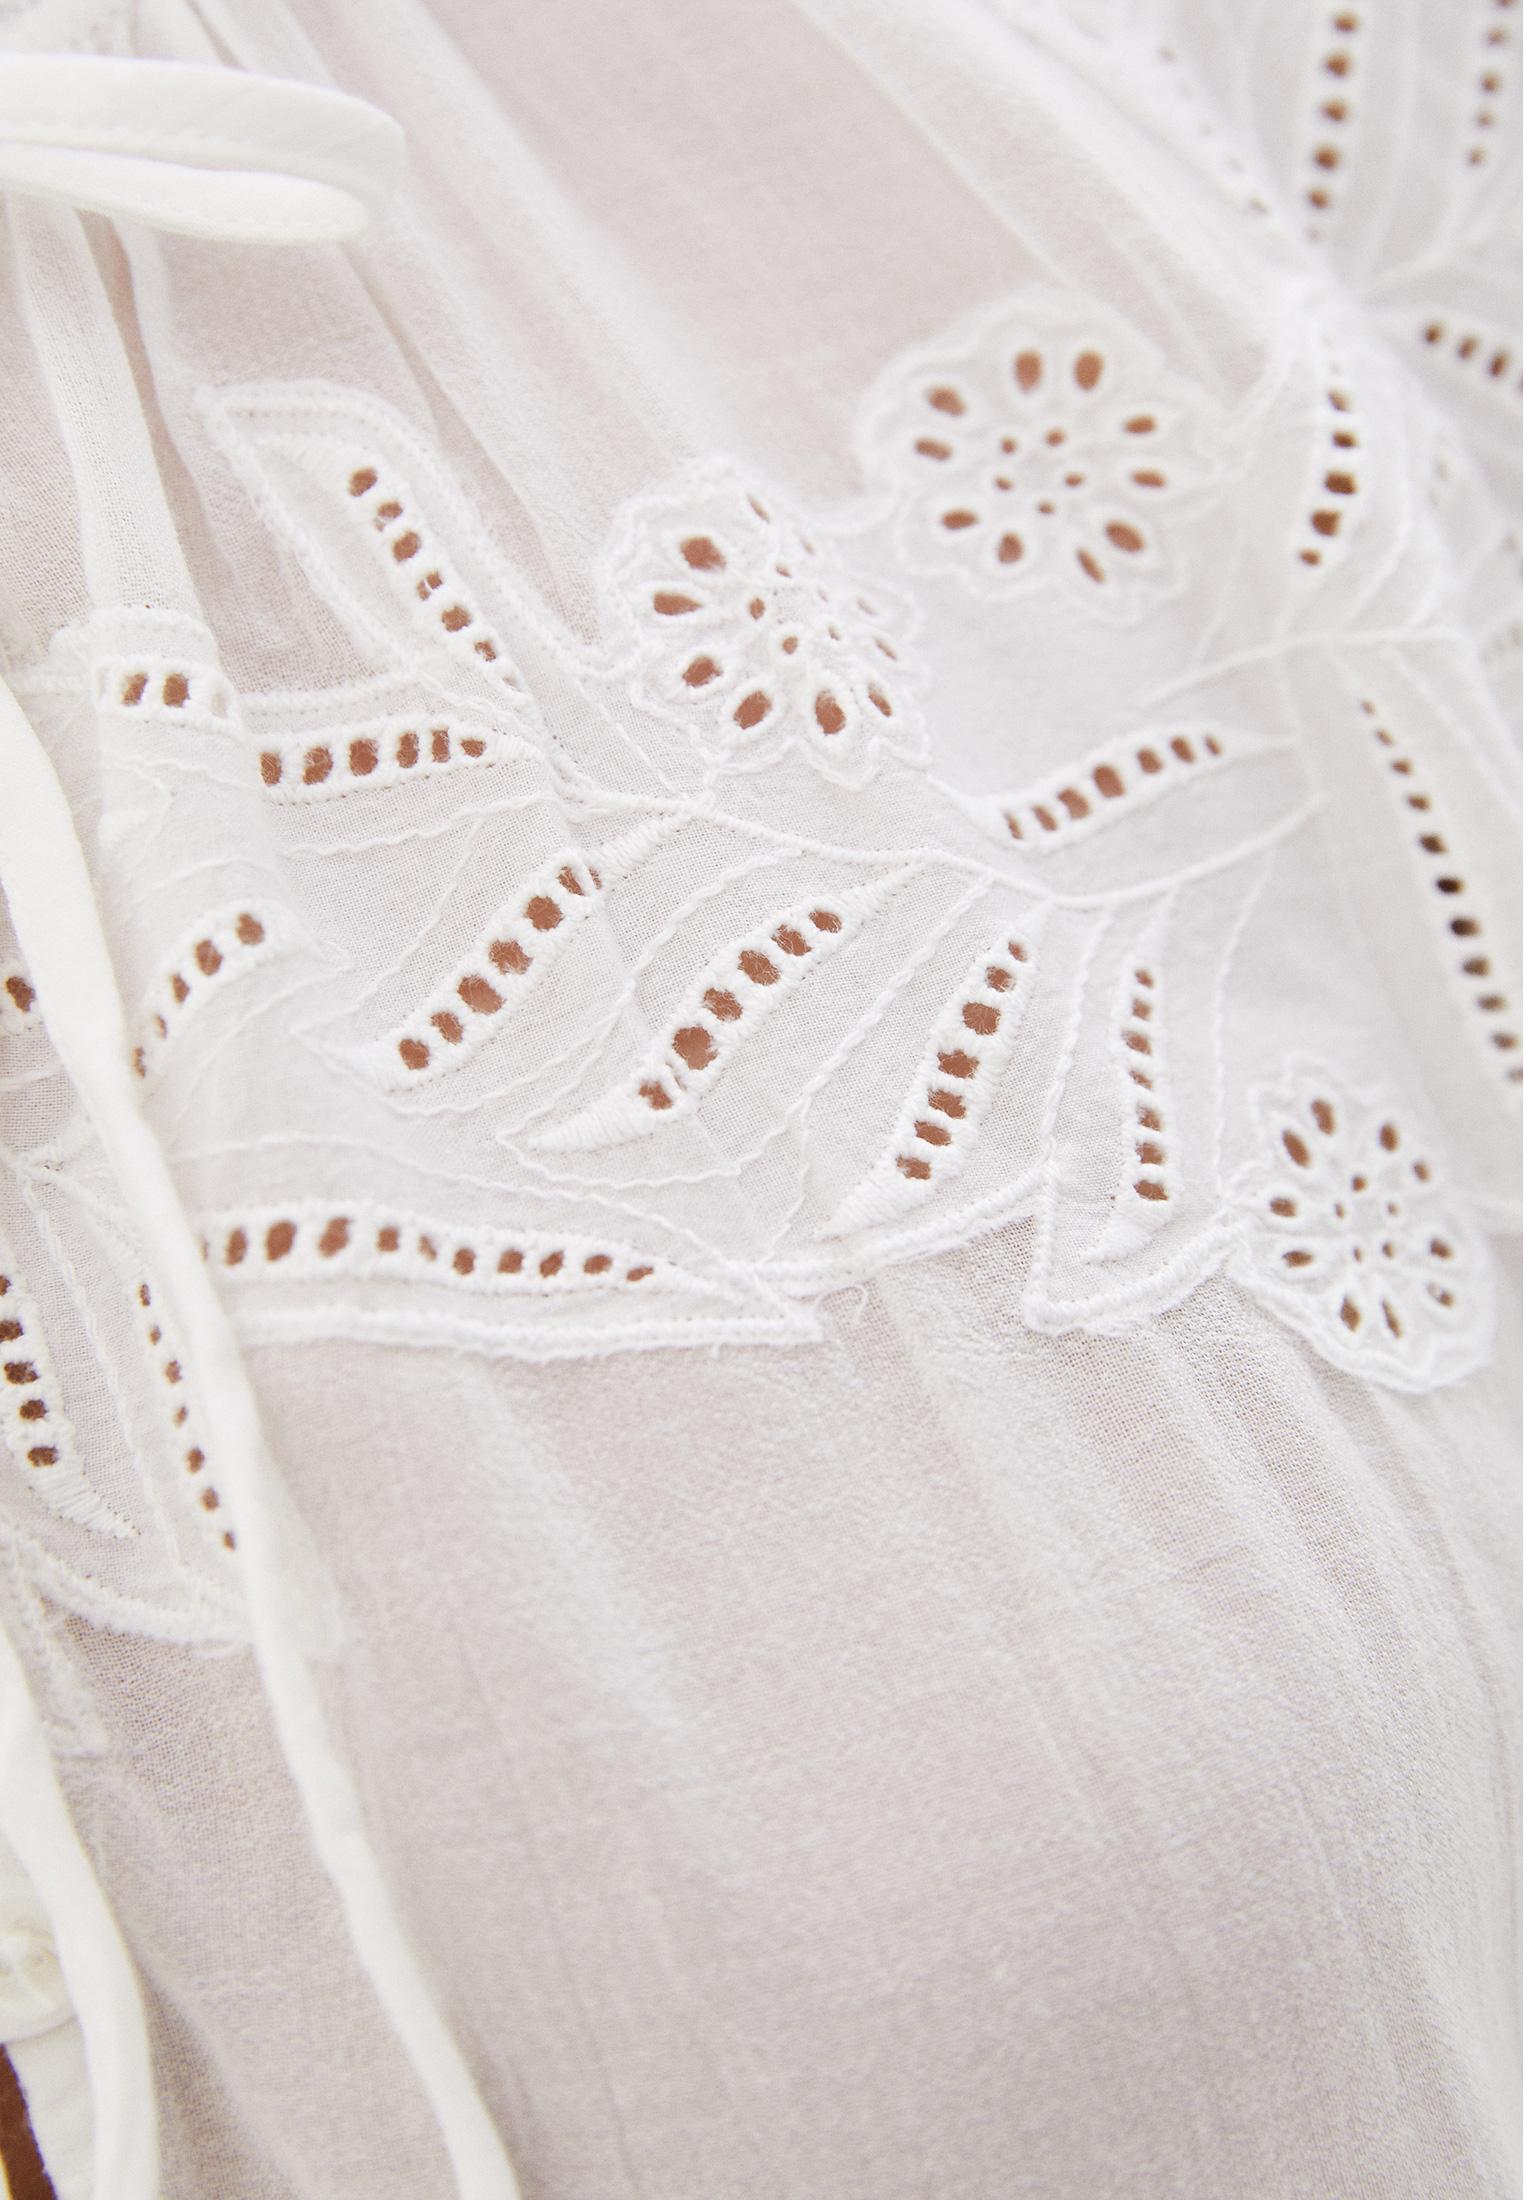 Блуза Tommy Hilfiger (Томми Хилфигер) WW0WW28162: изображение 4